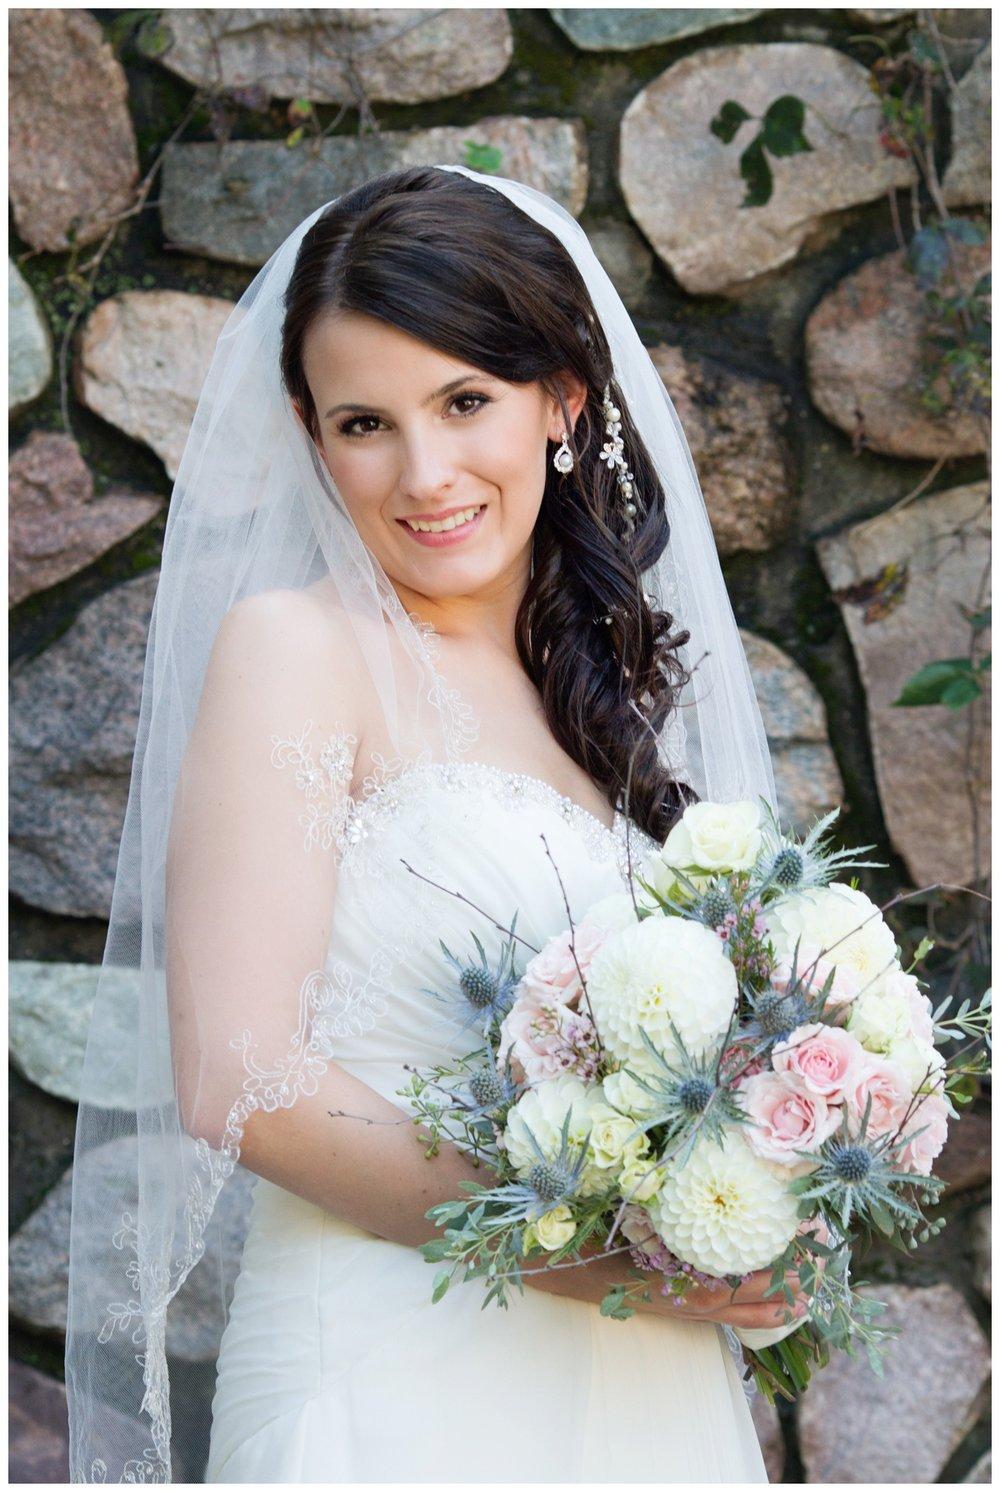 Bride | Michigan Wedding Photography | Alyssia Booth's Candid & Studio